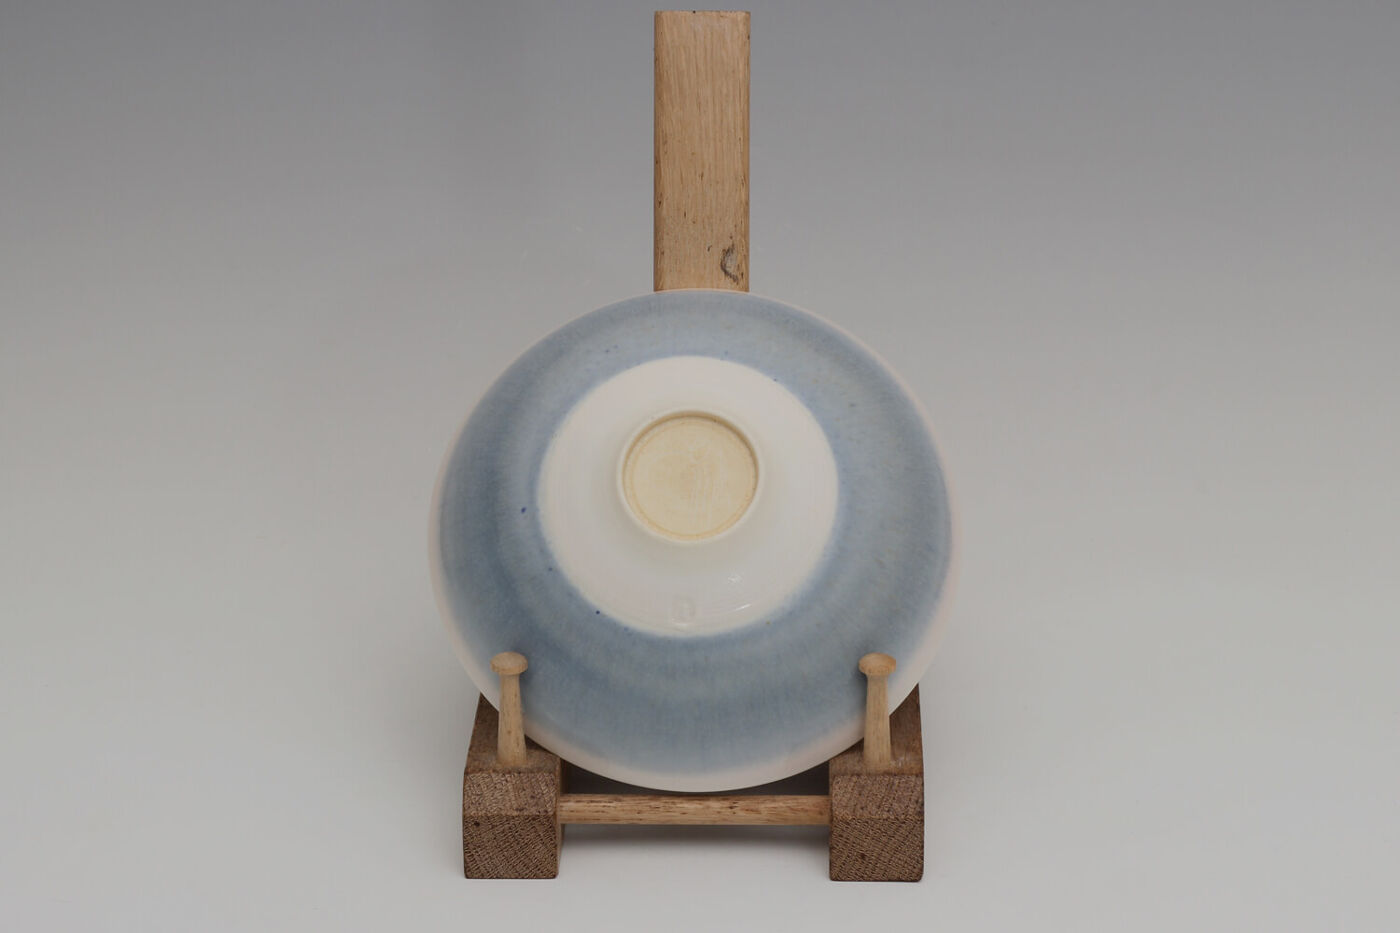 Peter Wills Ceramic Pale Blue Porcelain Bowl 211